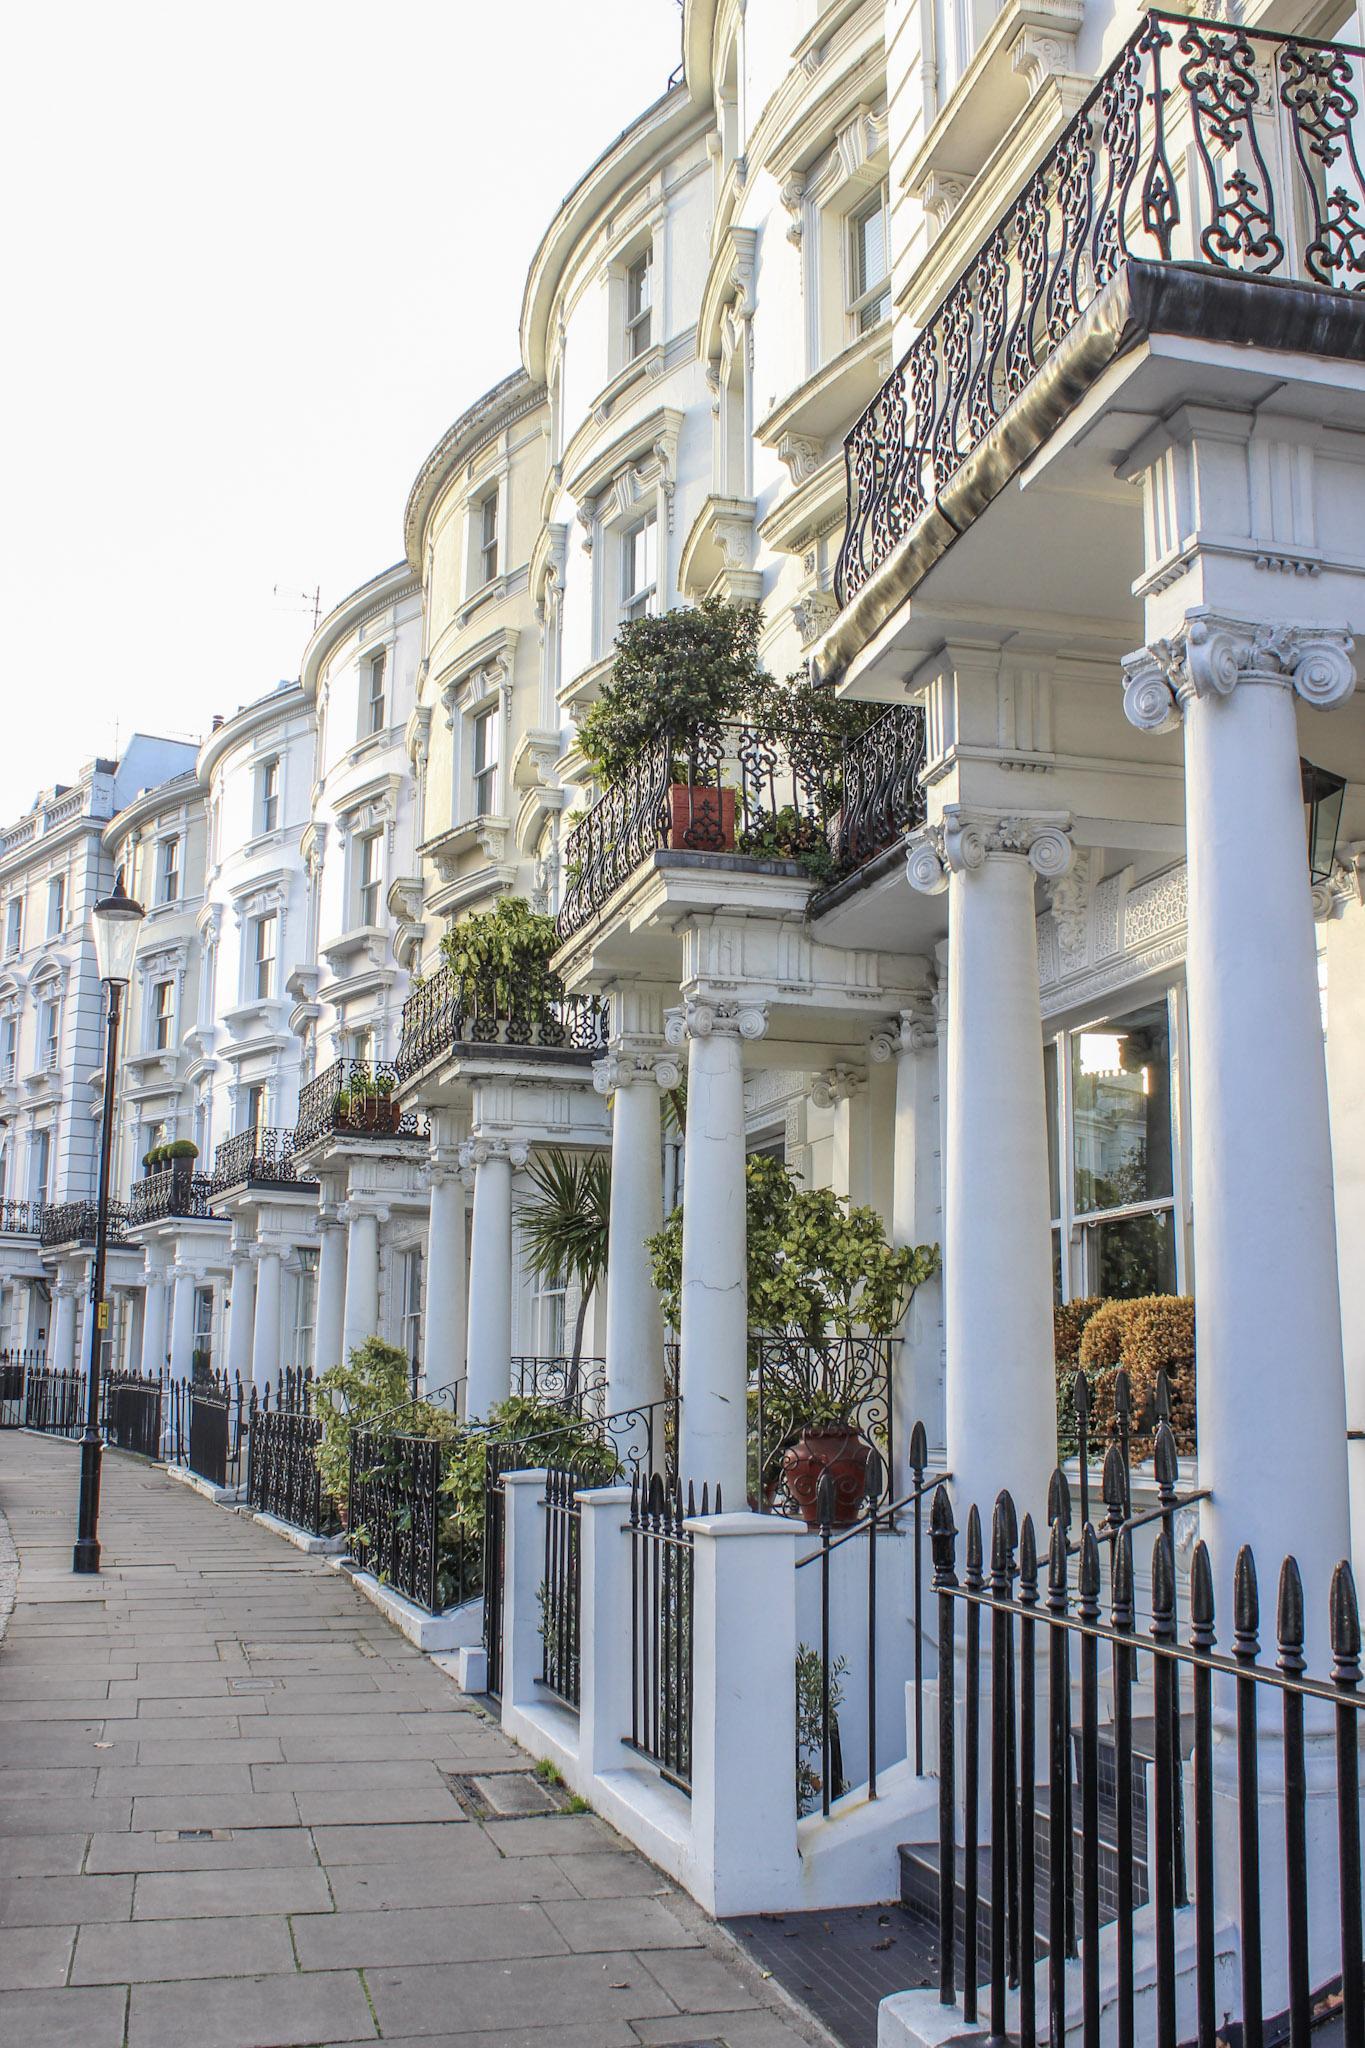 secret.honeymoons.london.streets.jpg